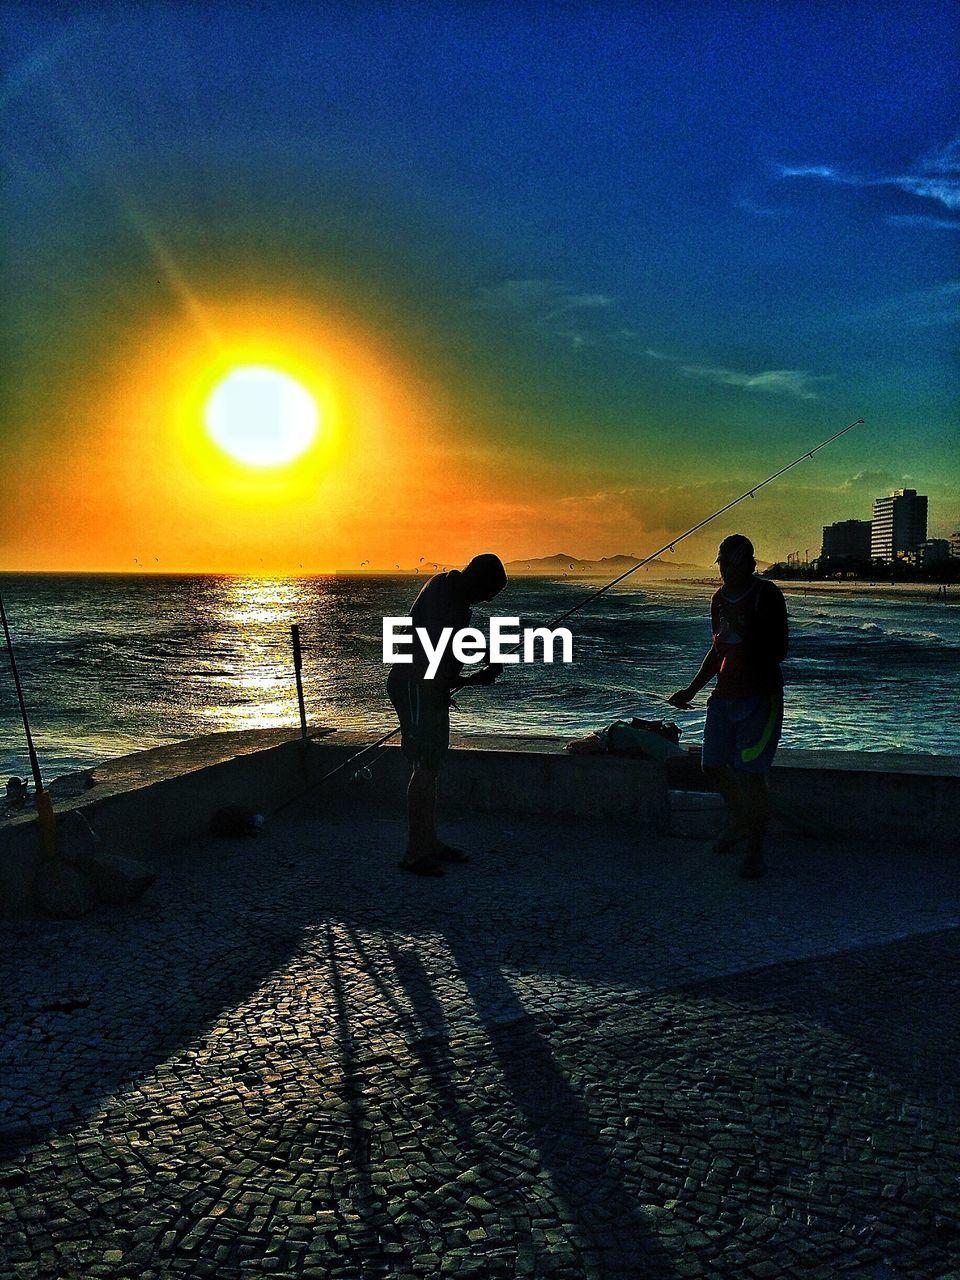 Silhouette men fishing against sea during sunset